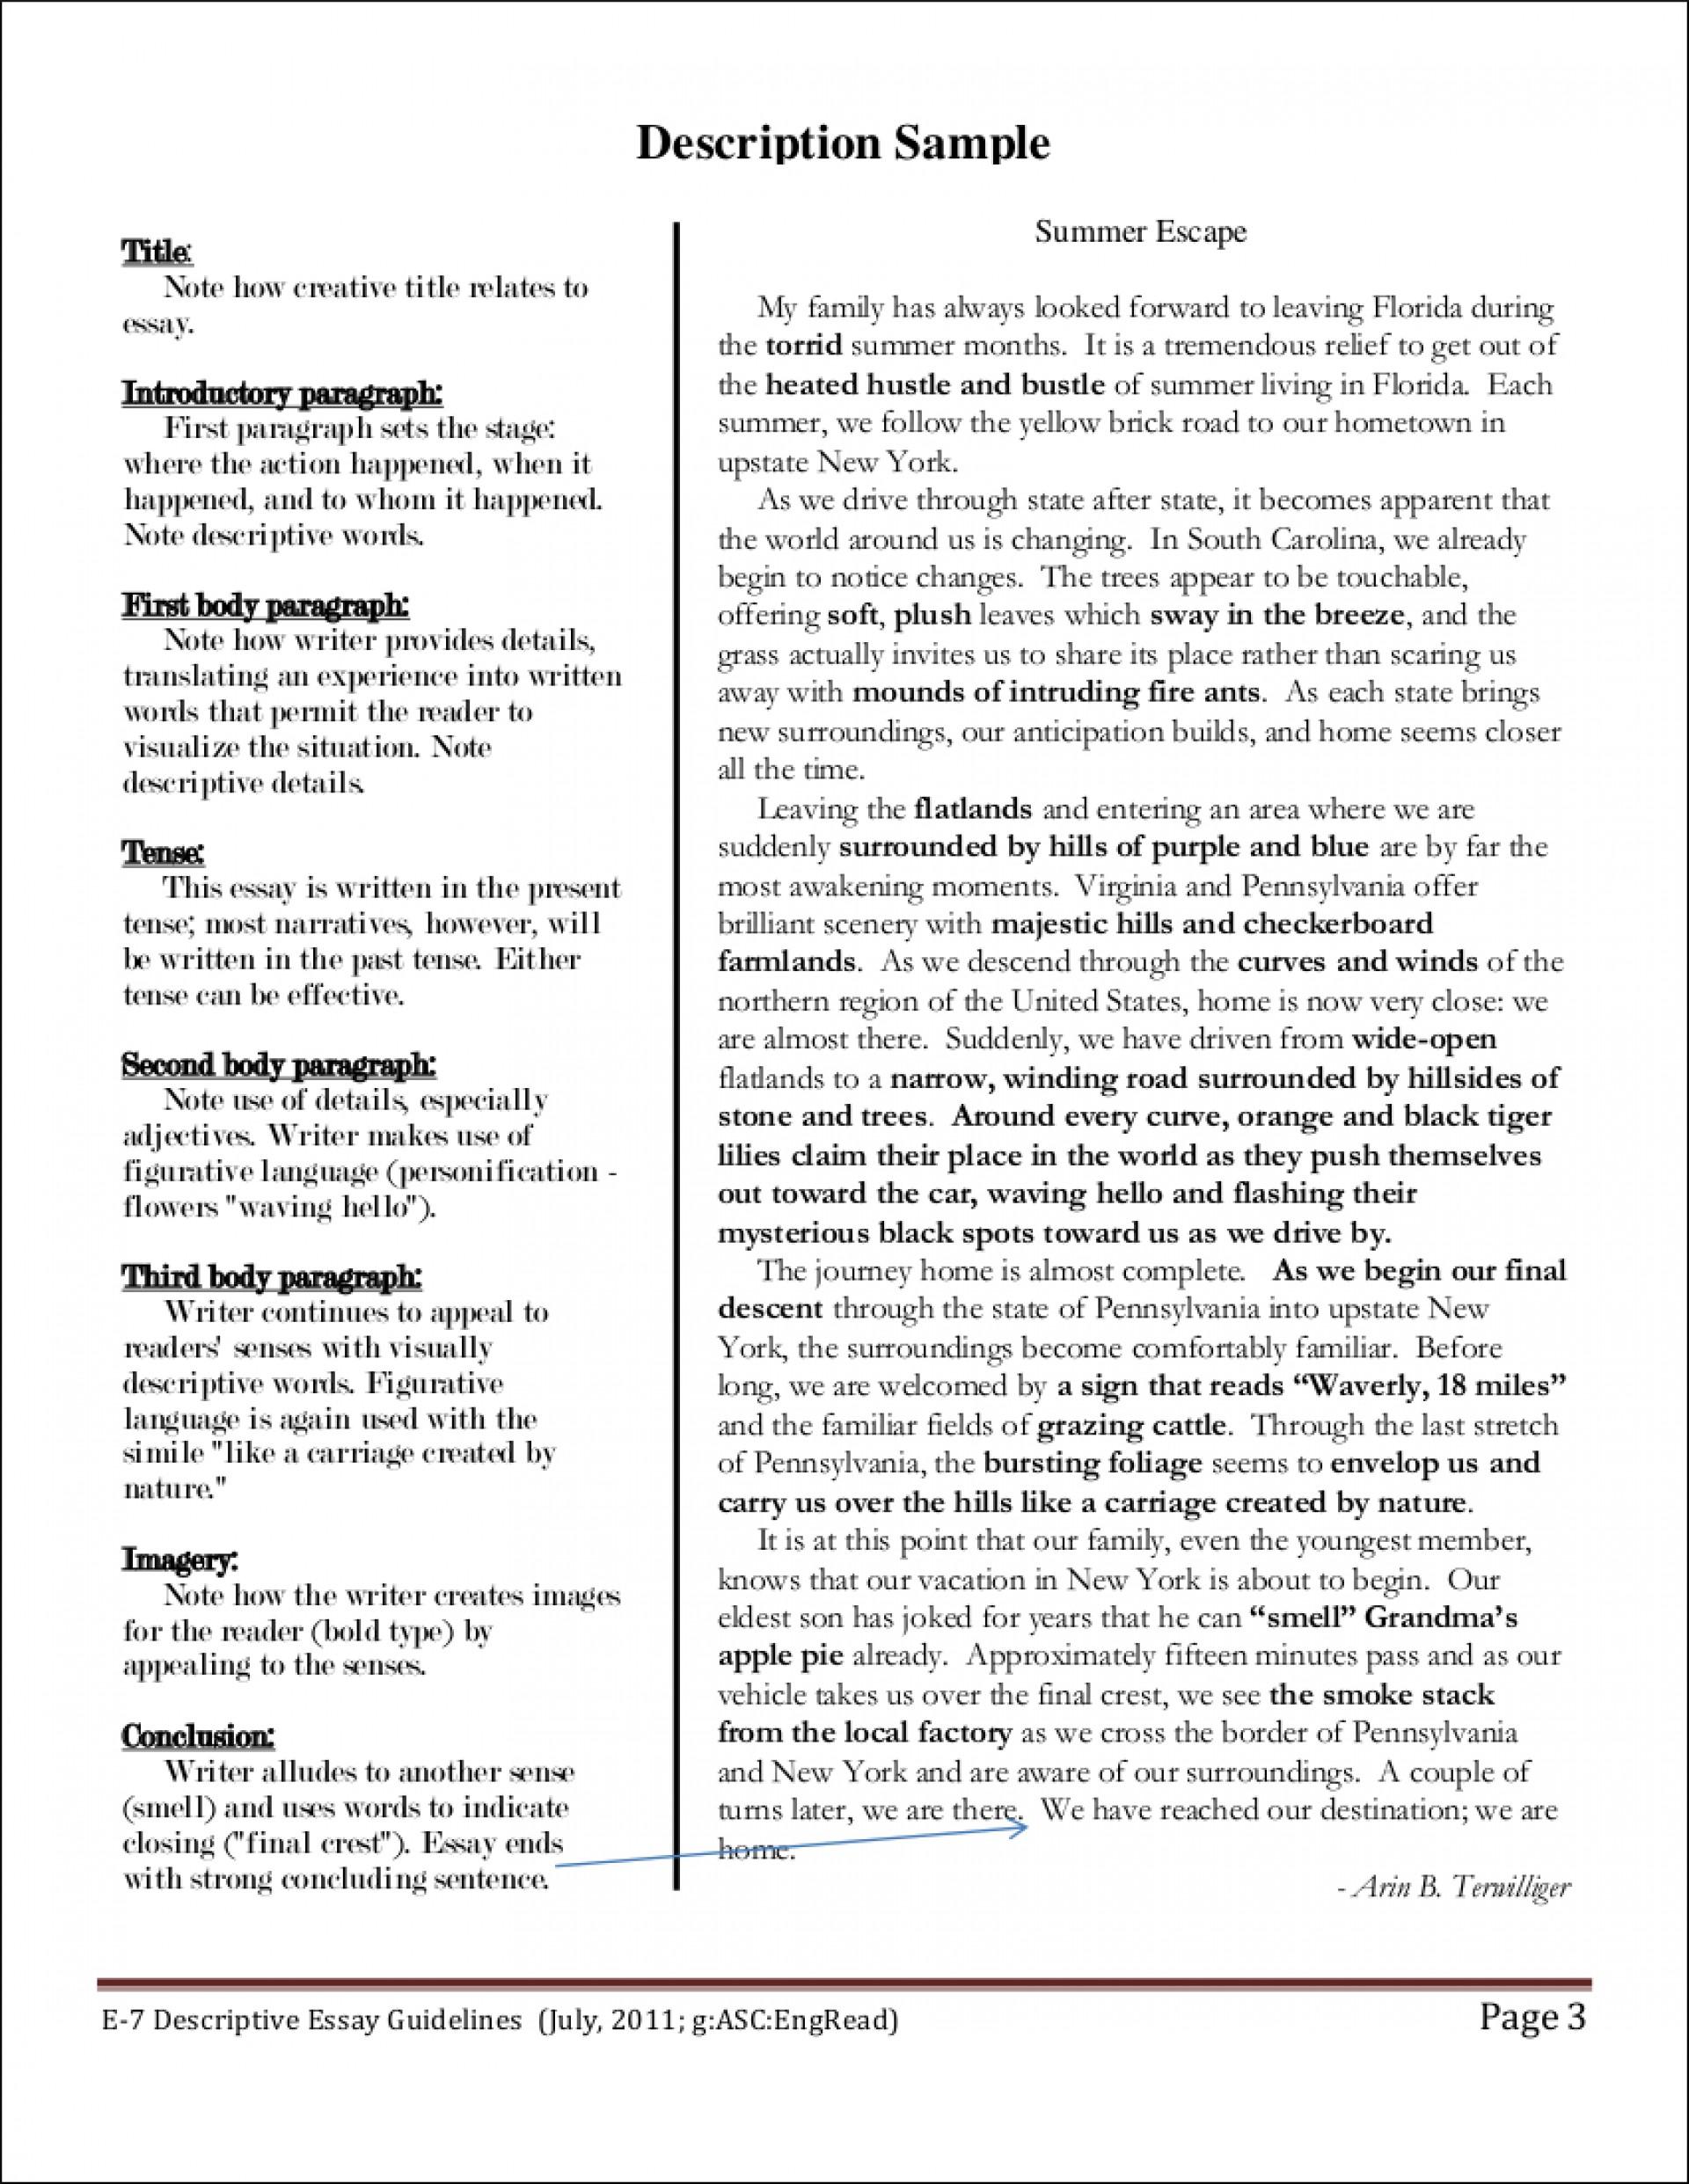 016 Descriptive Essays Process Pdf Examp Argumentative Narrative Exemplification Classification Persuasive Sat Writing Opinion Unbelievable Essay Gujarati Free Download Terrorism 1920